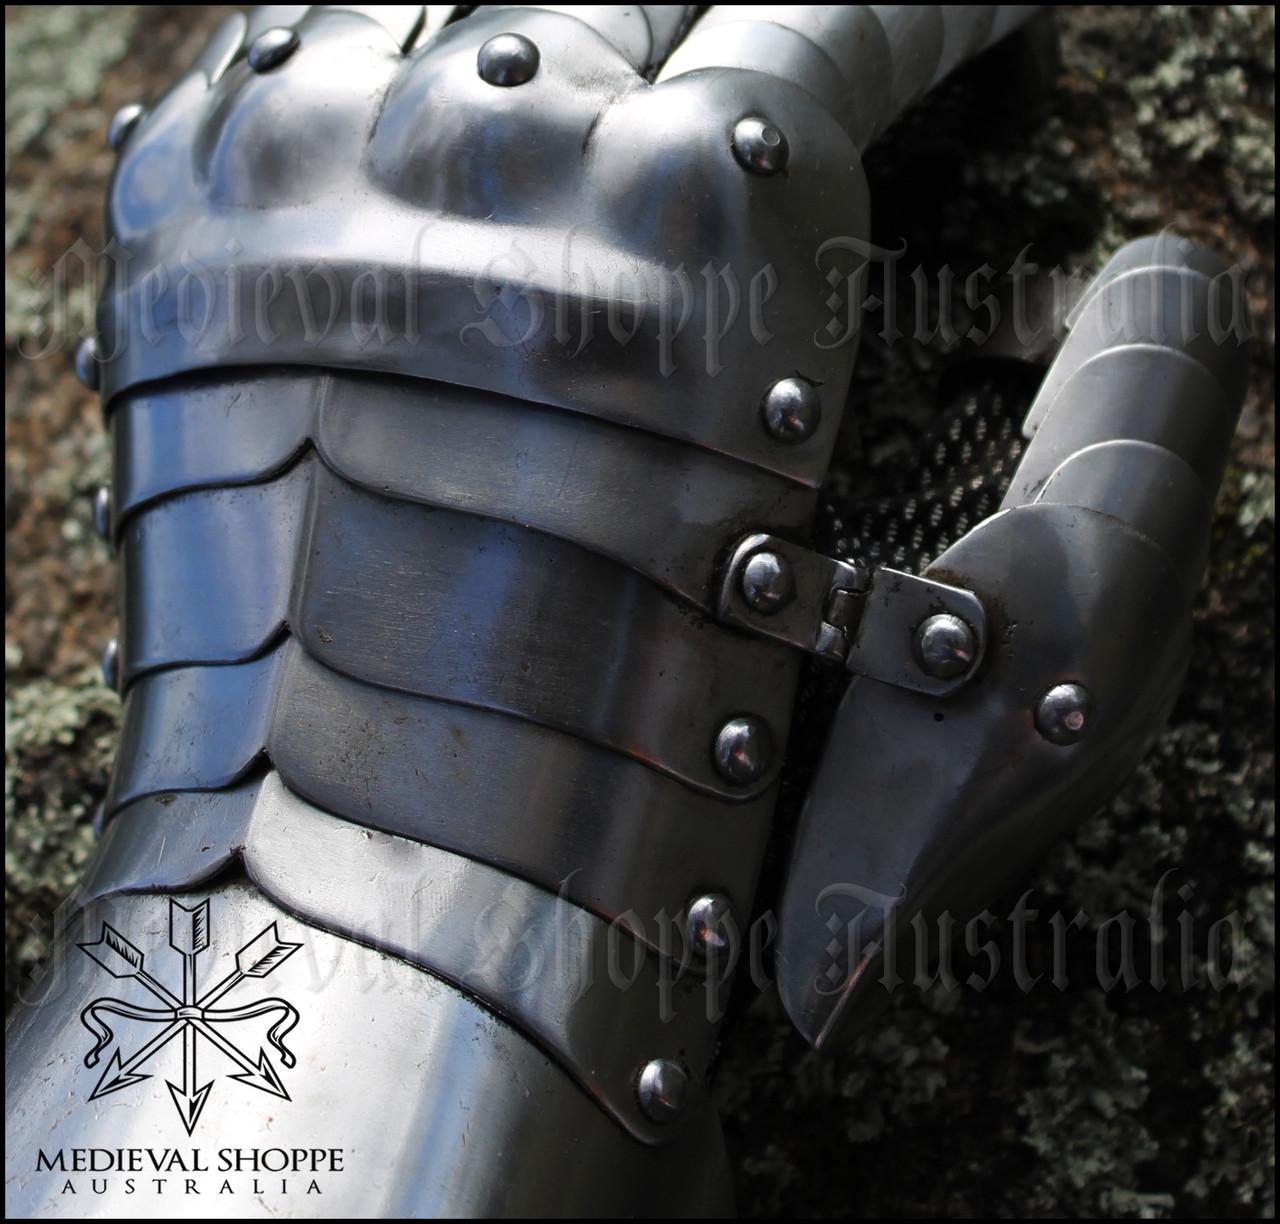 Fingered Gauntlets 18g (without gloves)